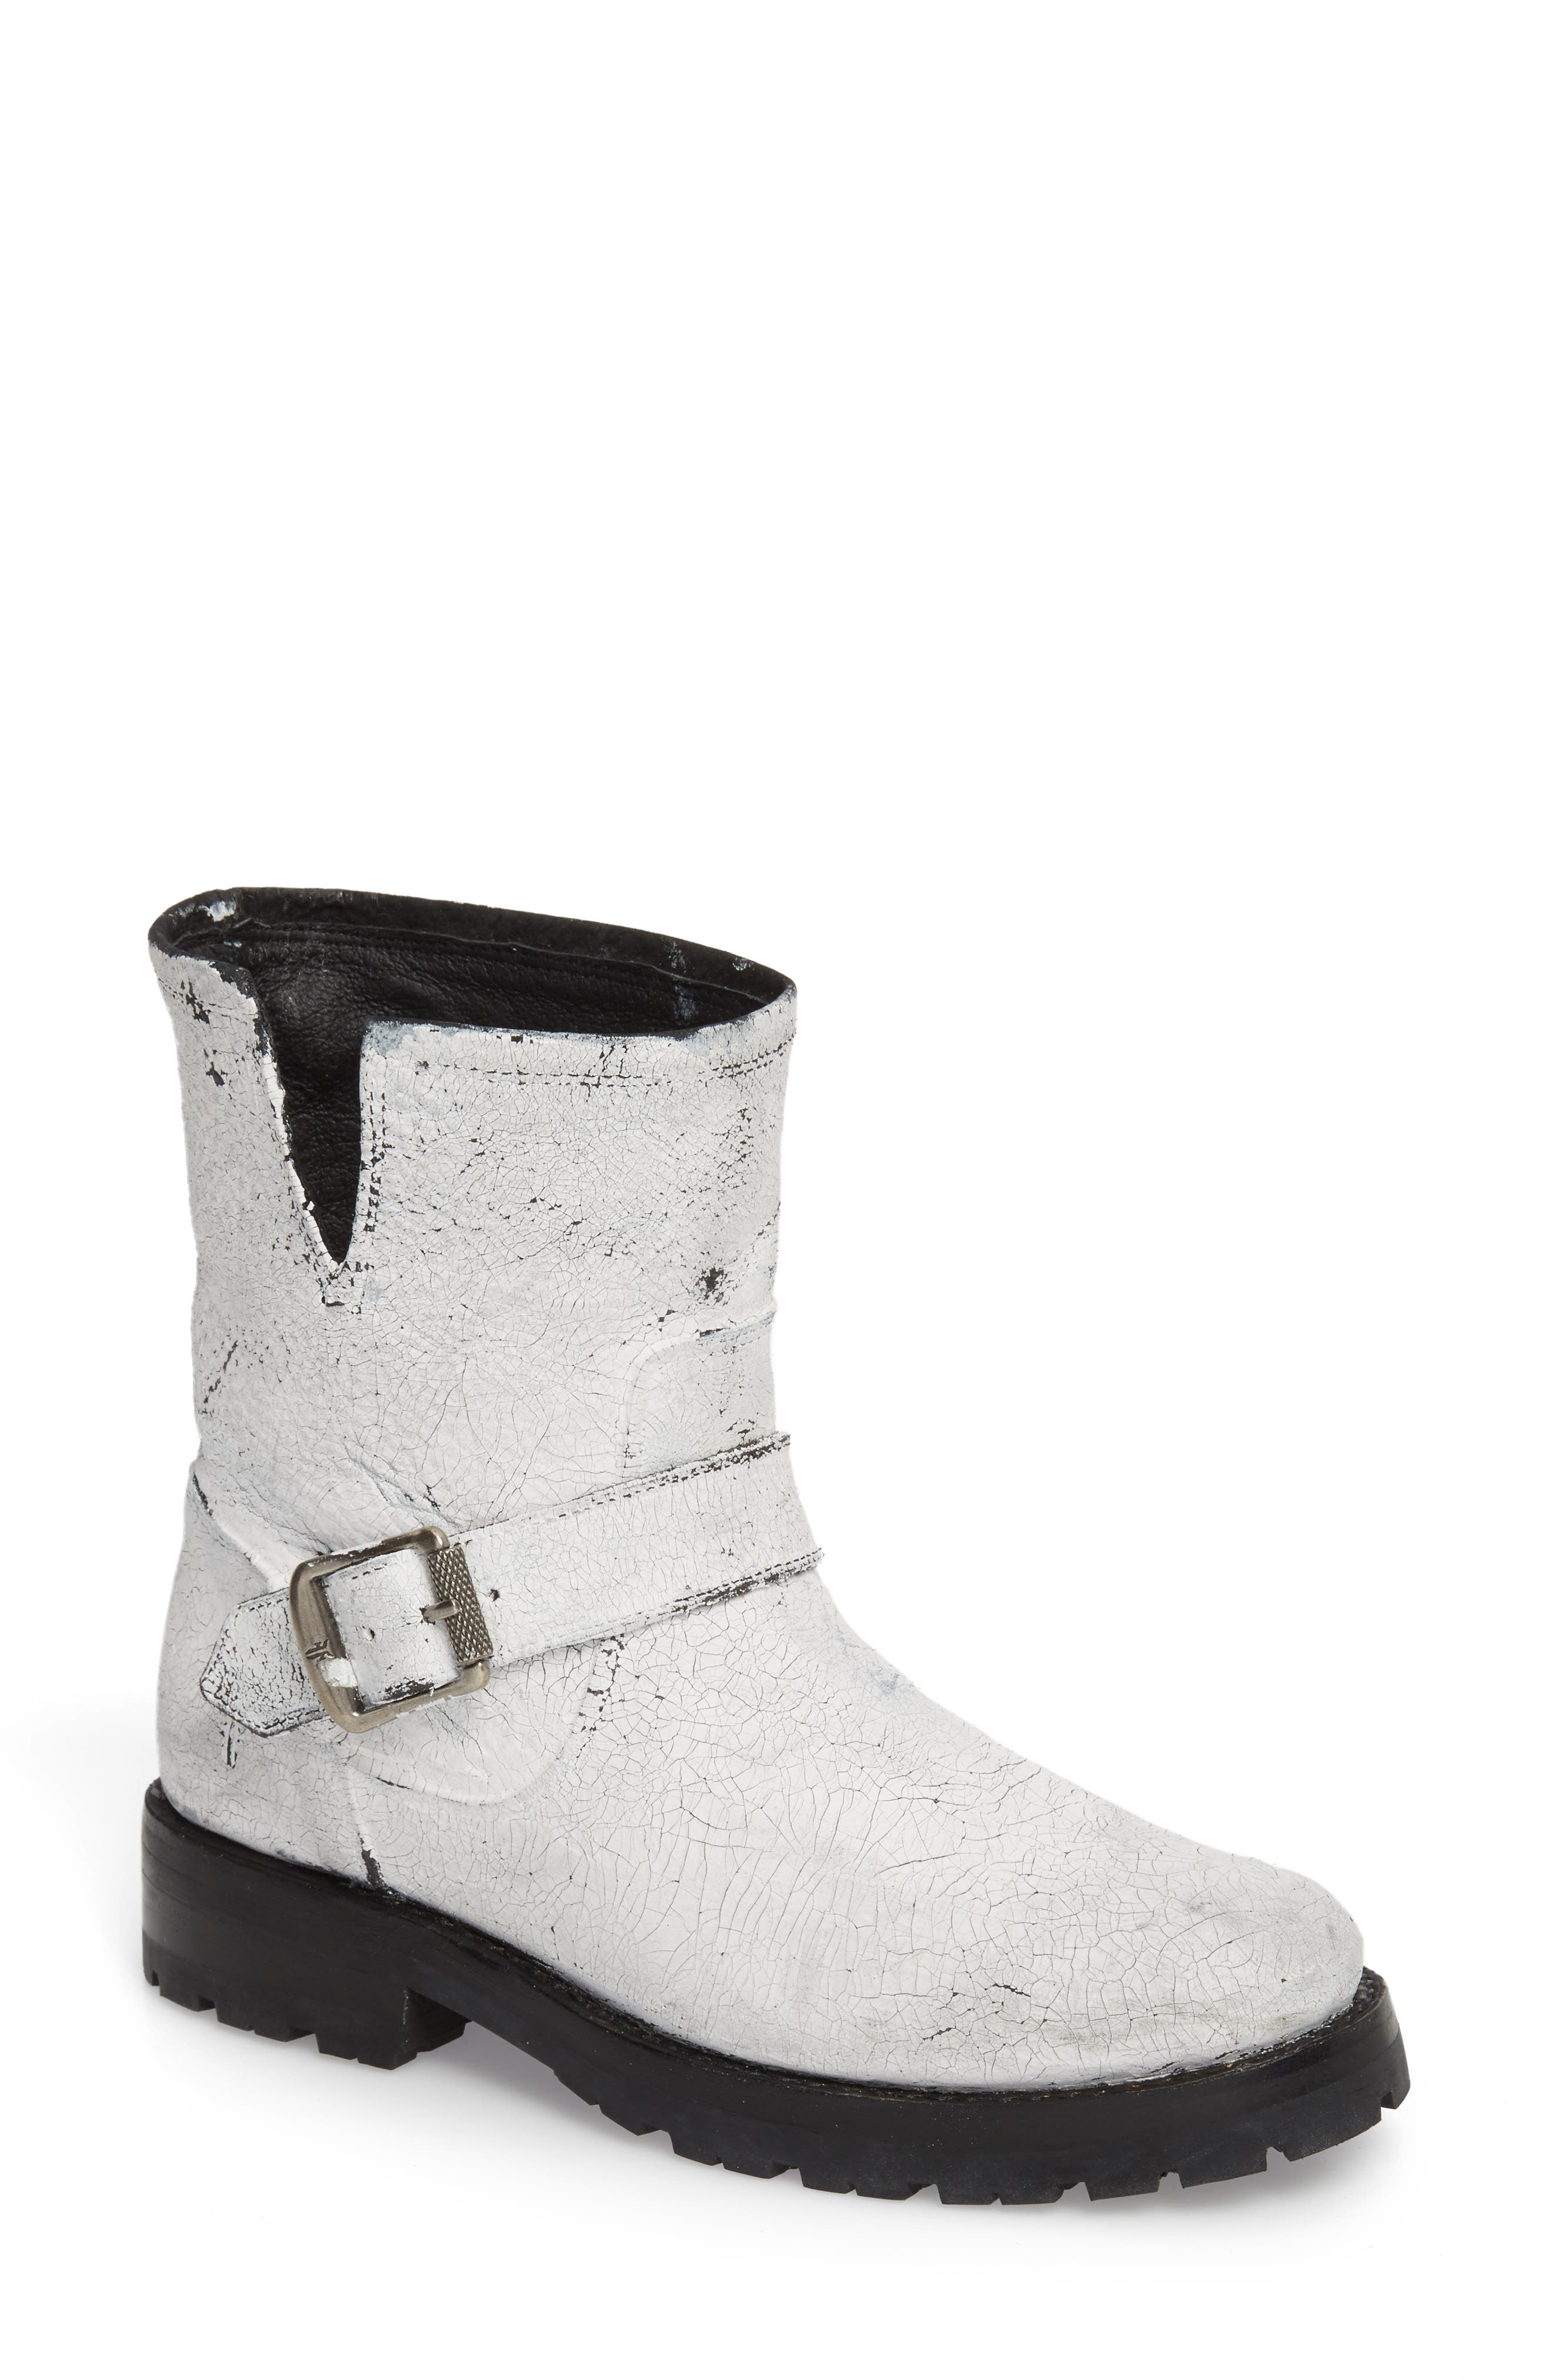 Frye Natalie Engineer Boot, White